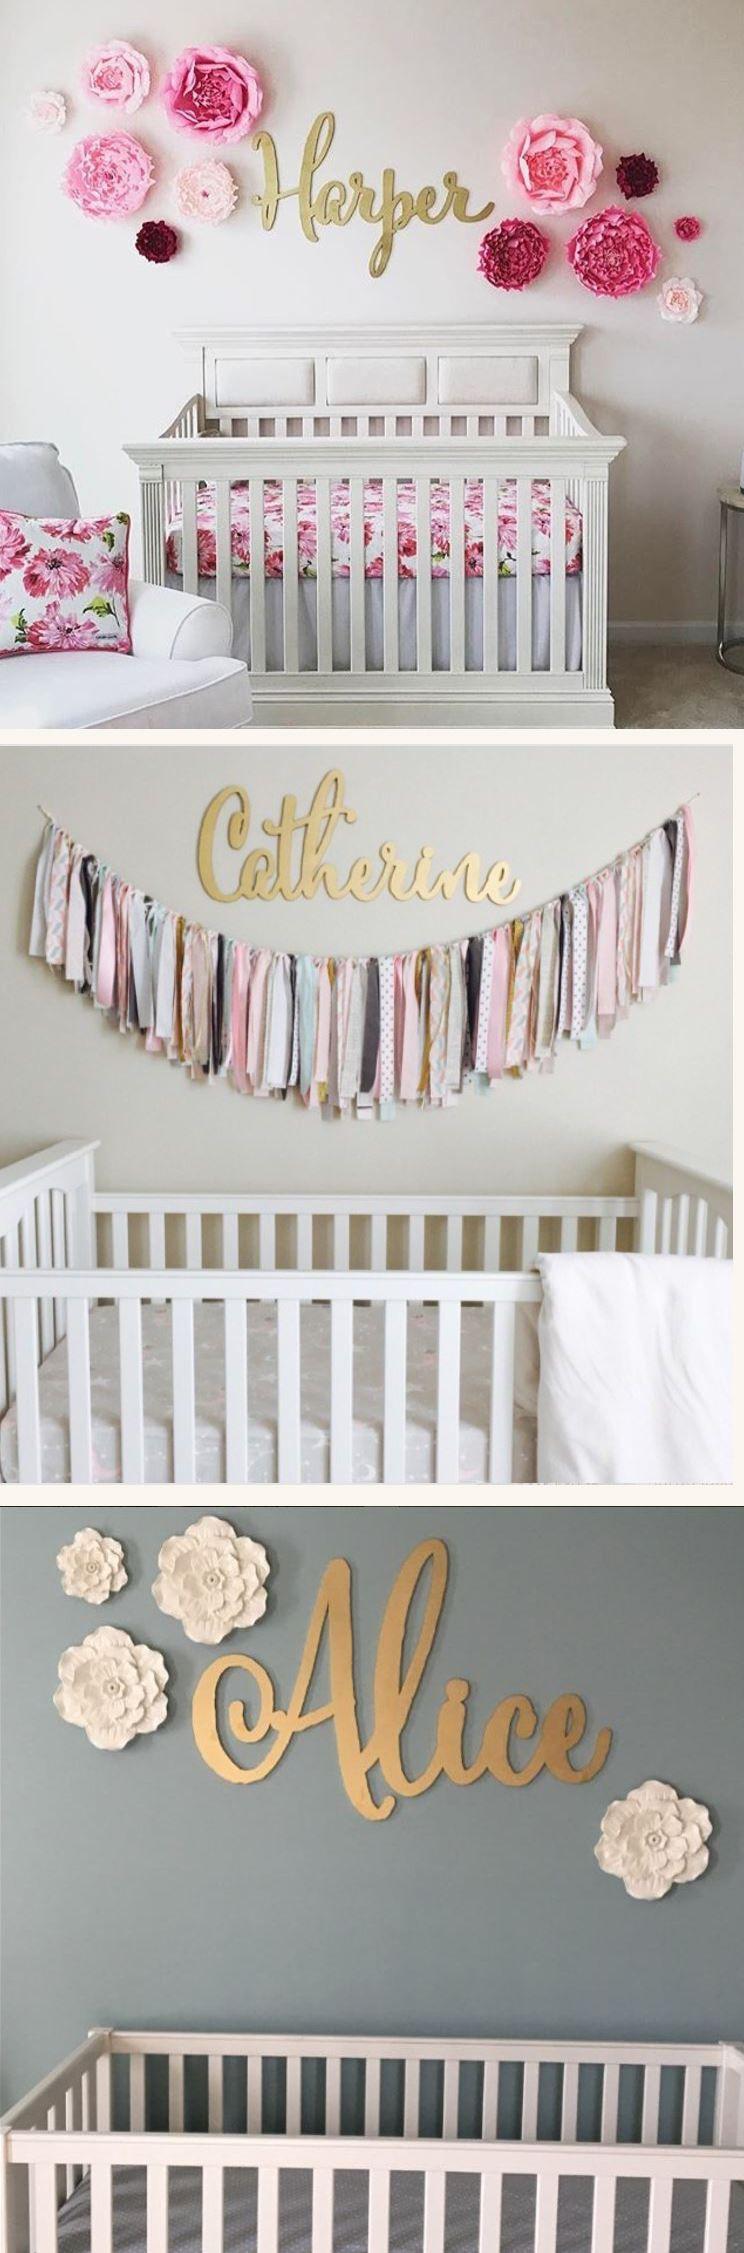 Gorgeous Nursery Room Decoration